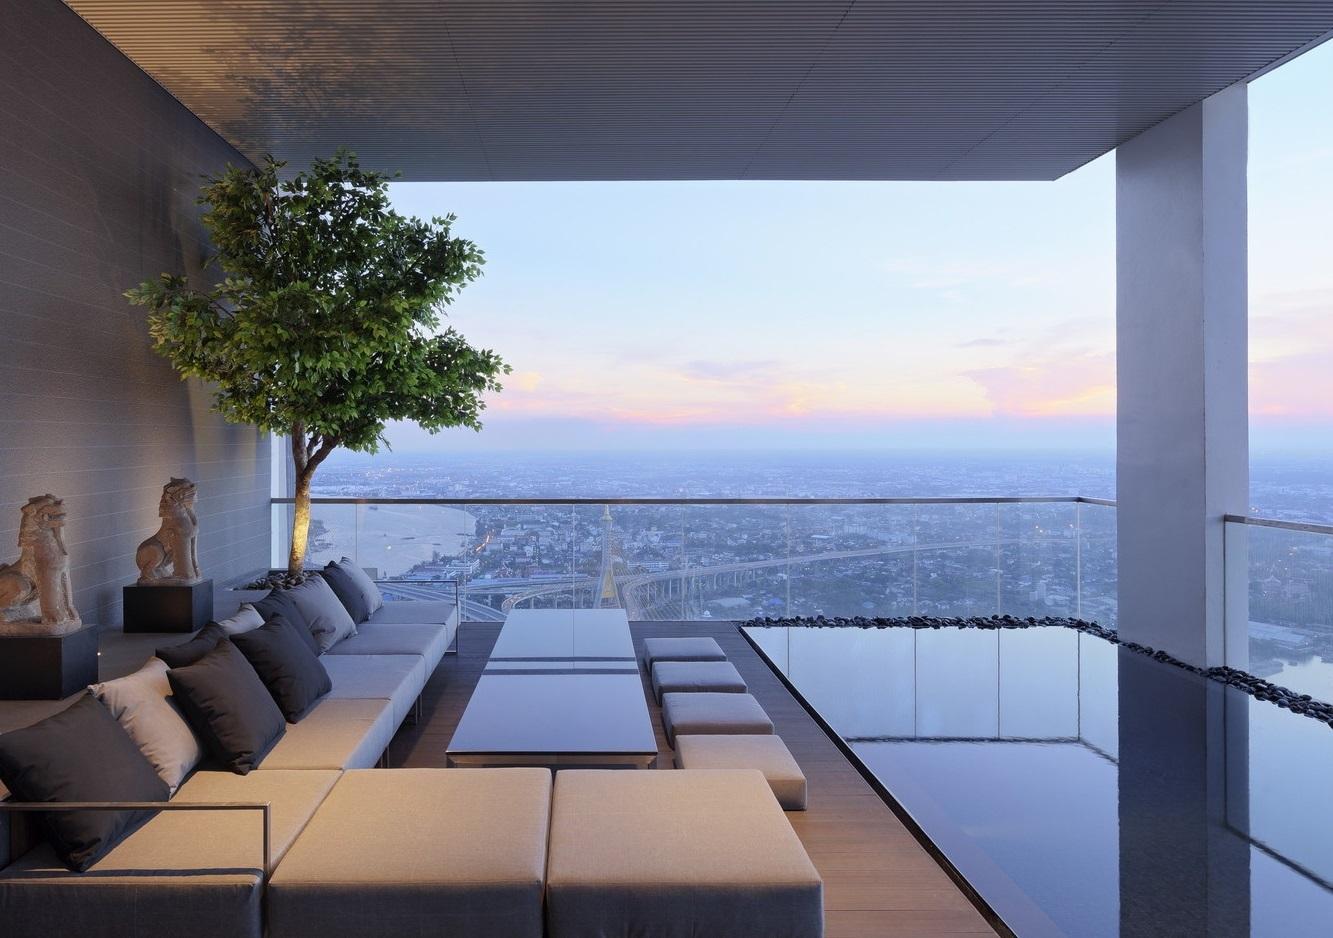 Dizajn penthausa: Arhitektura u oblacima